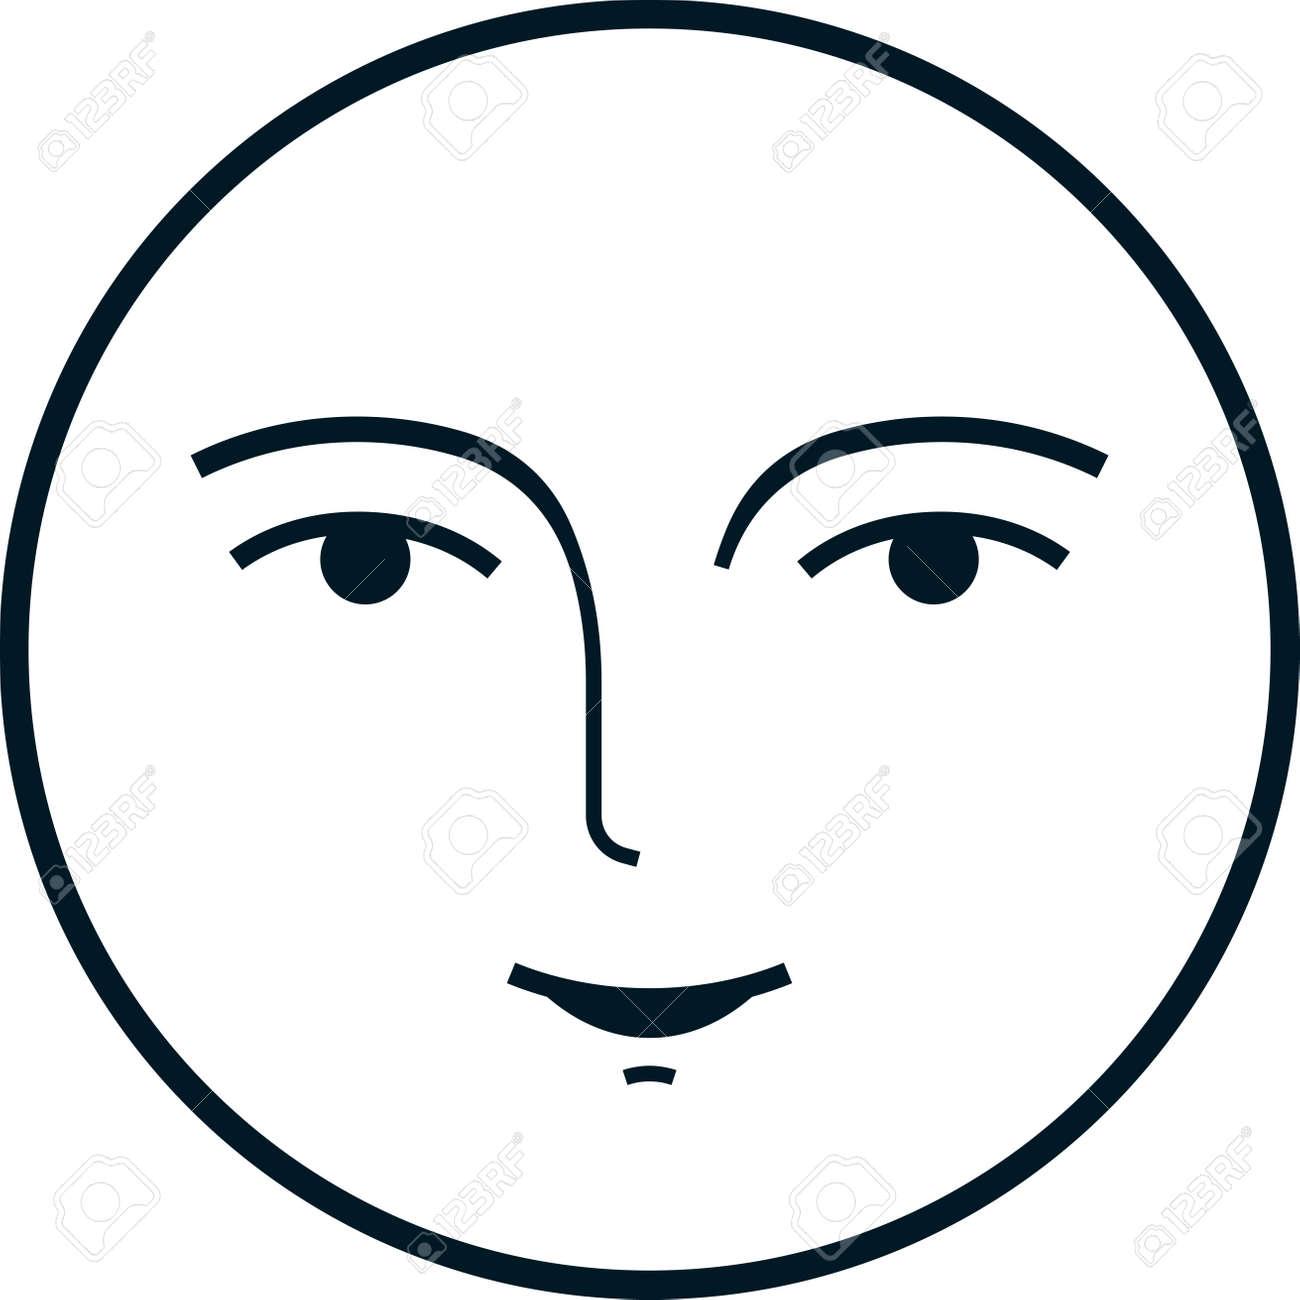 Full moon face vintage vector illustration isolated